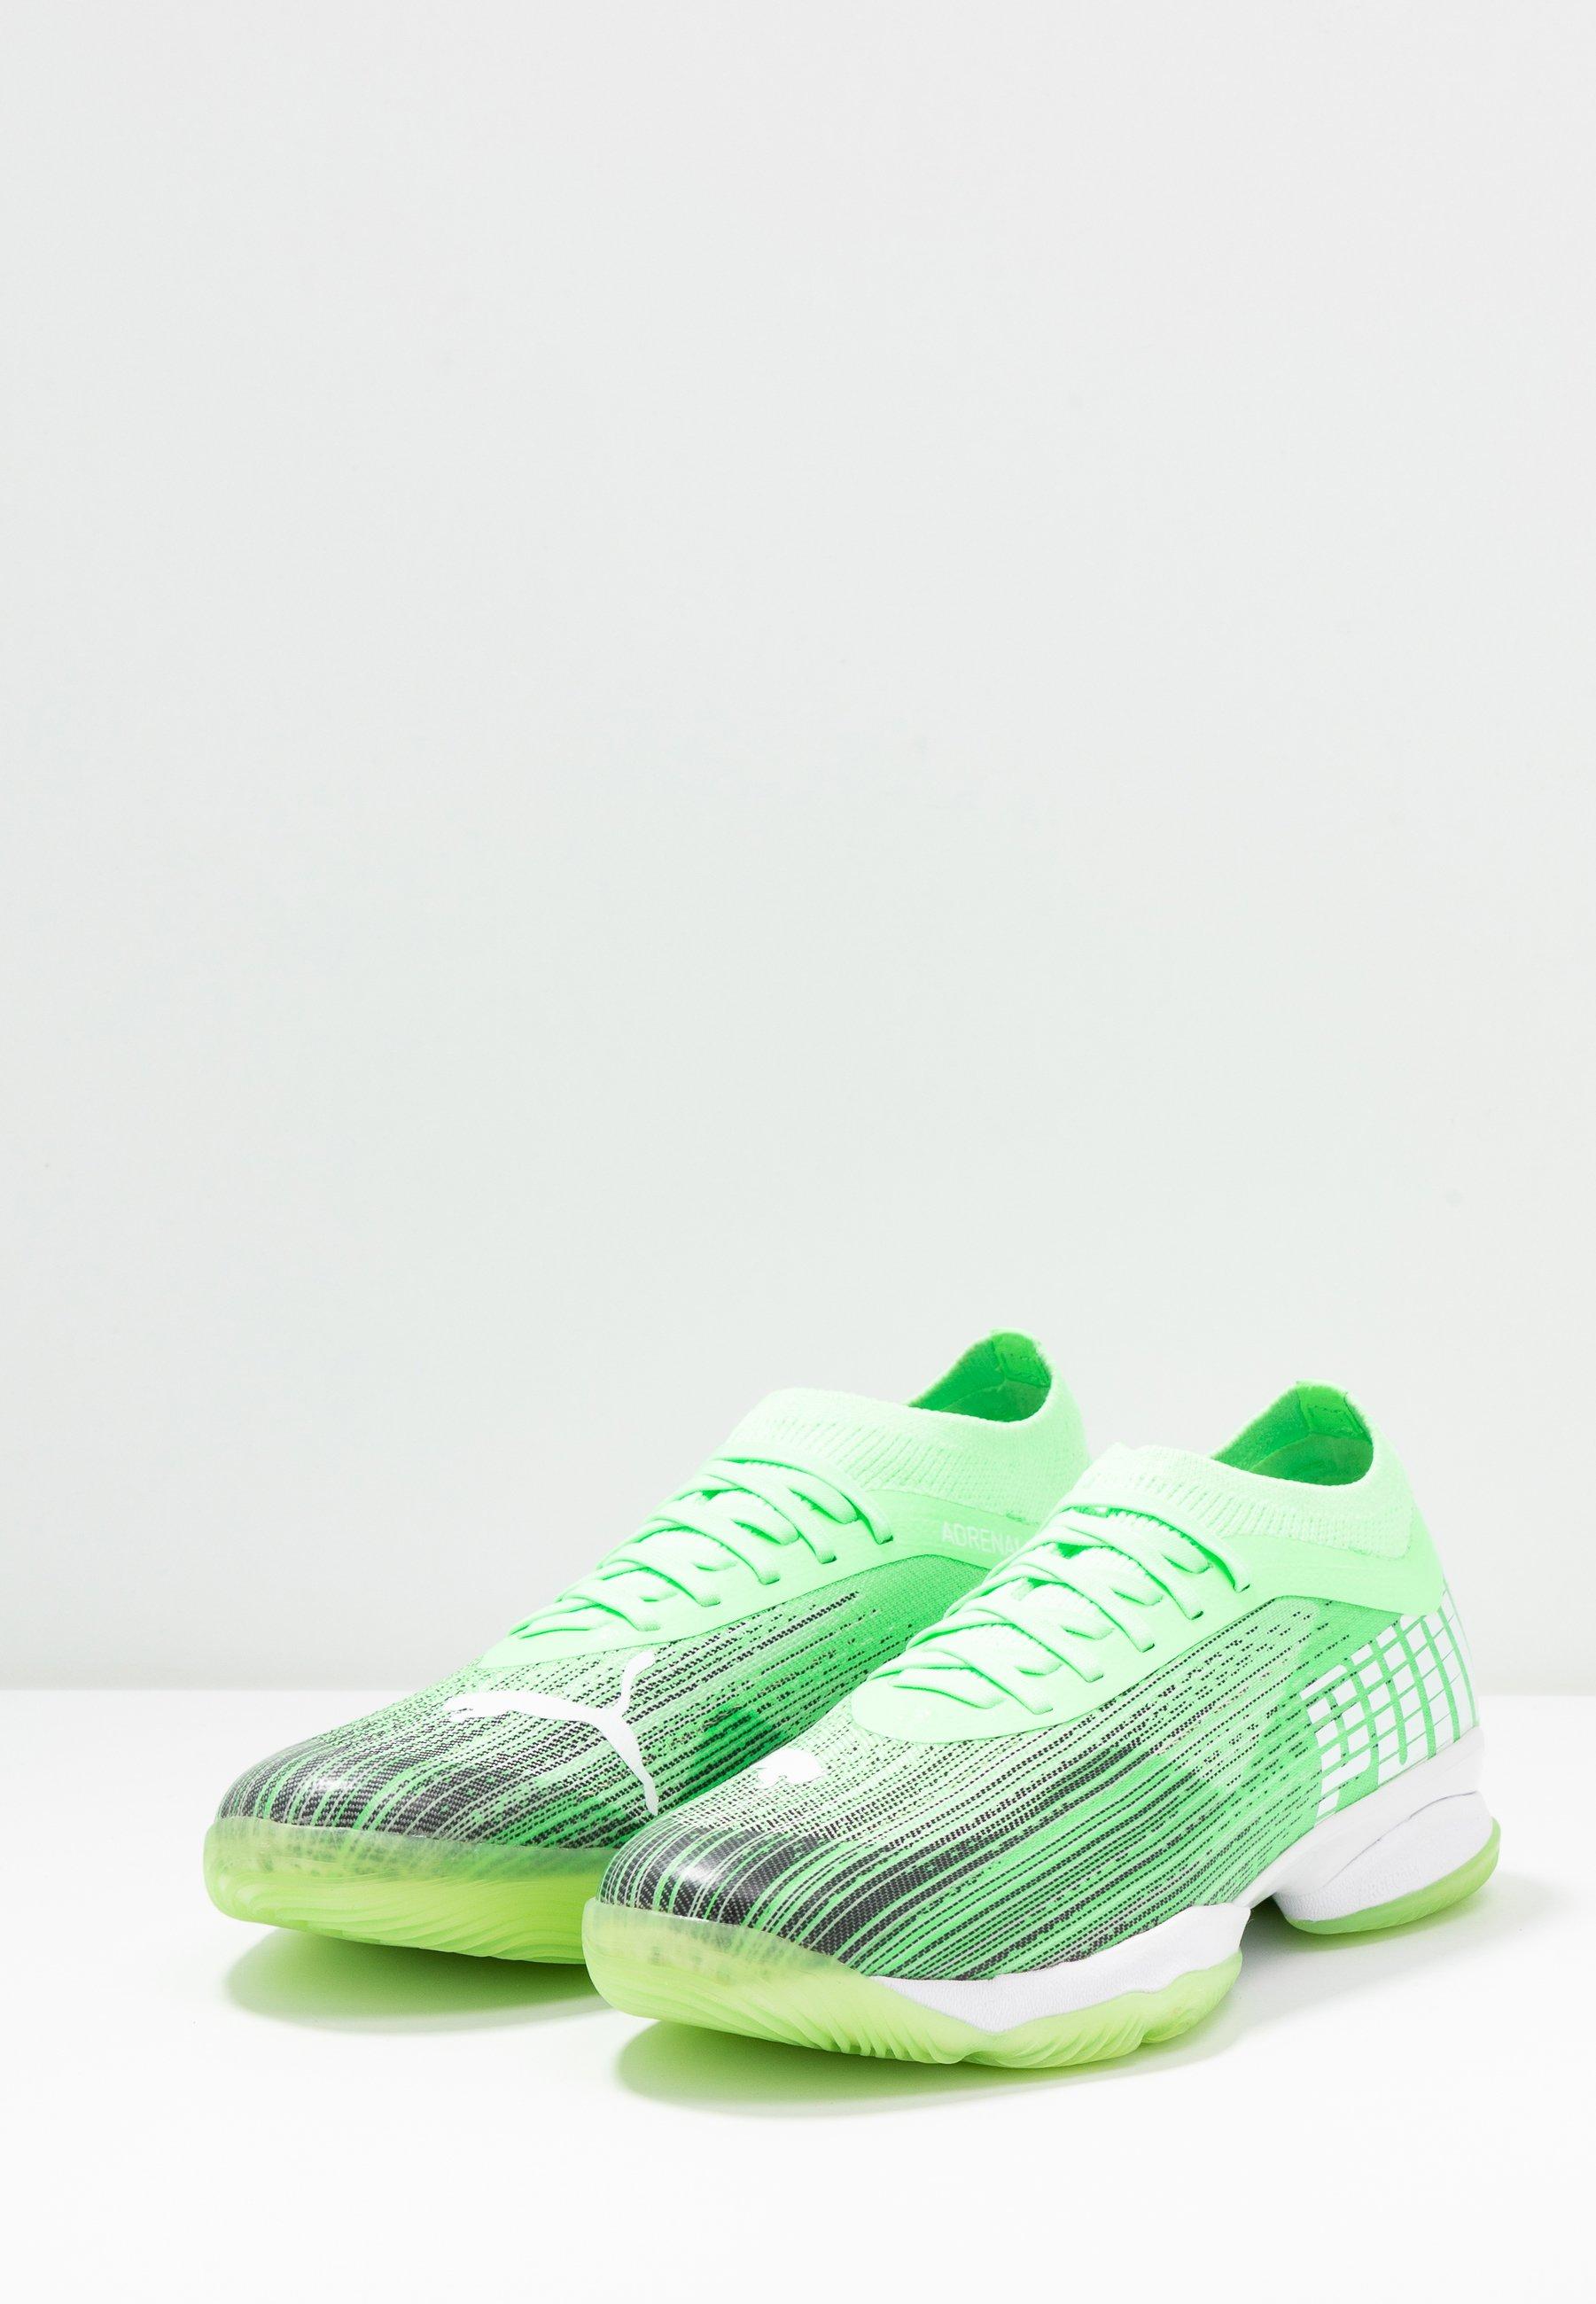 ADRENALITE 1.1 Chaussures de handball elektro greenblackwhite